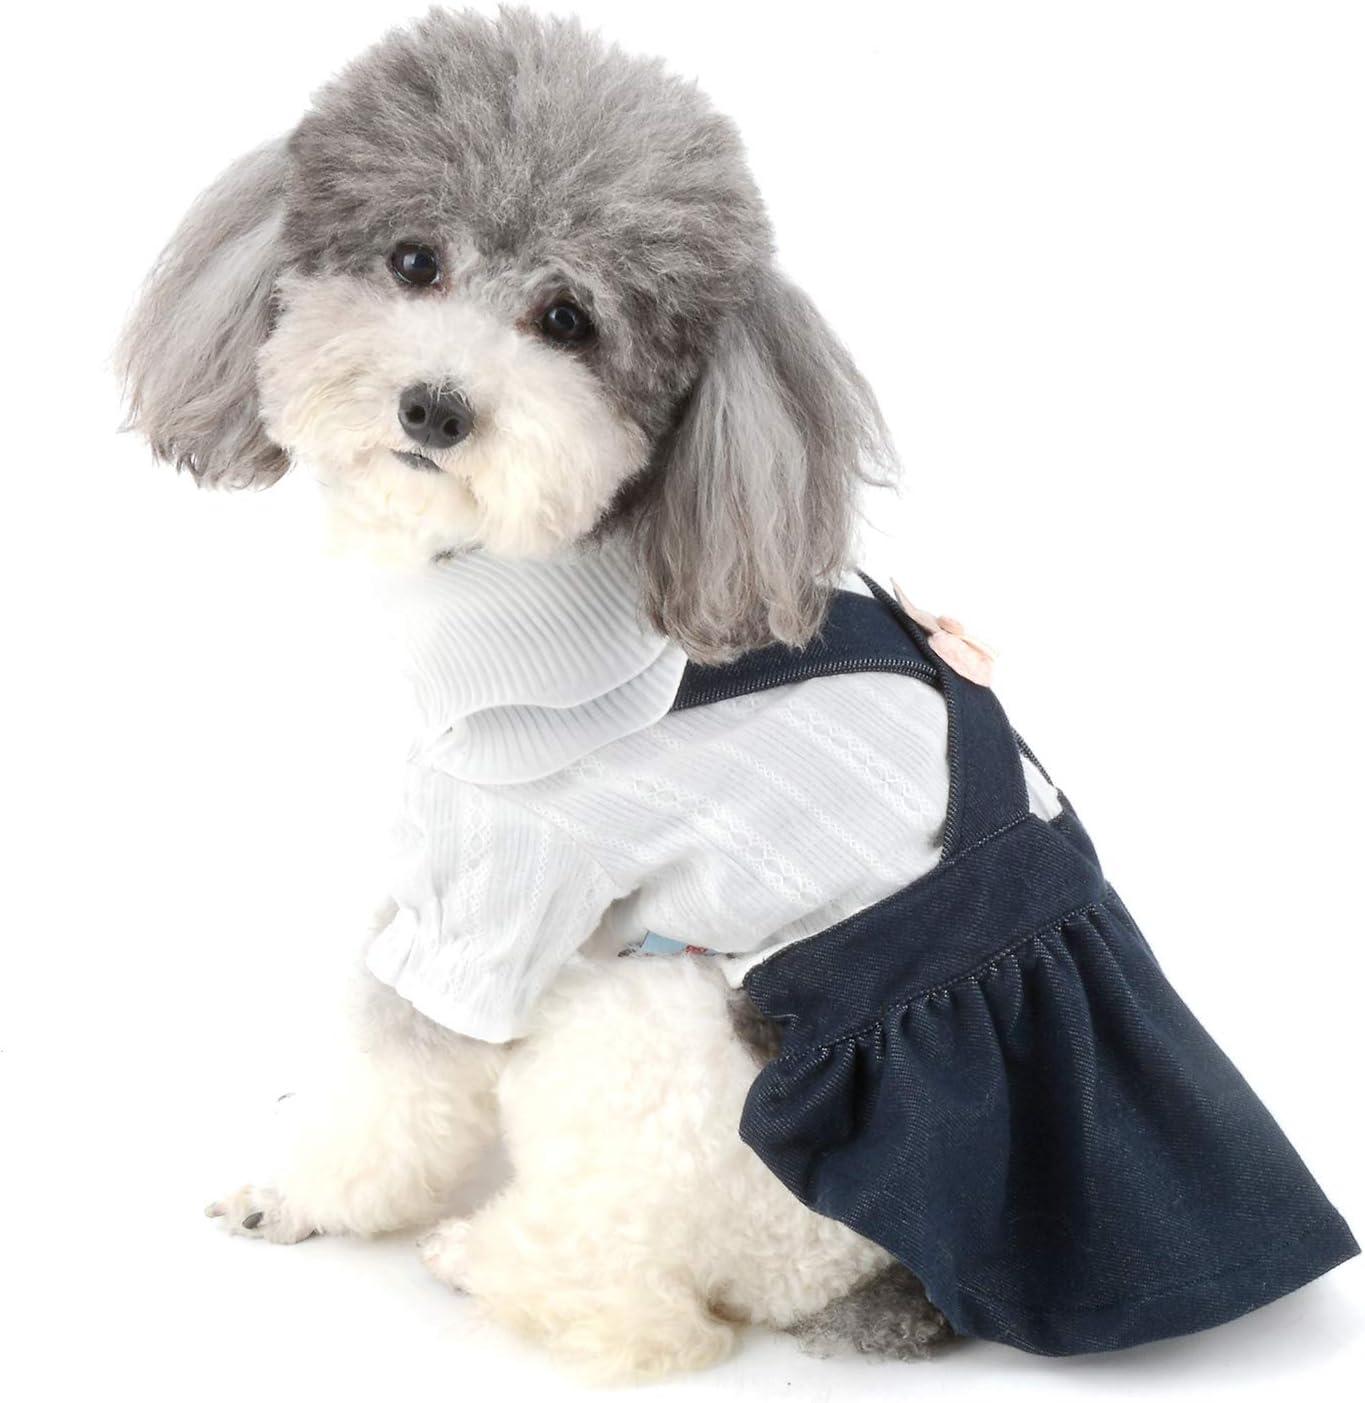 algod/ón suave dise/ño de oso Ranphy Pijama para perro peque/ño